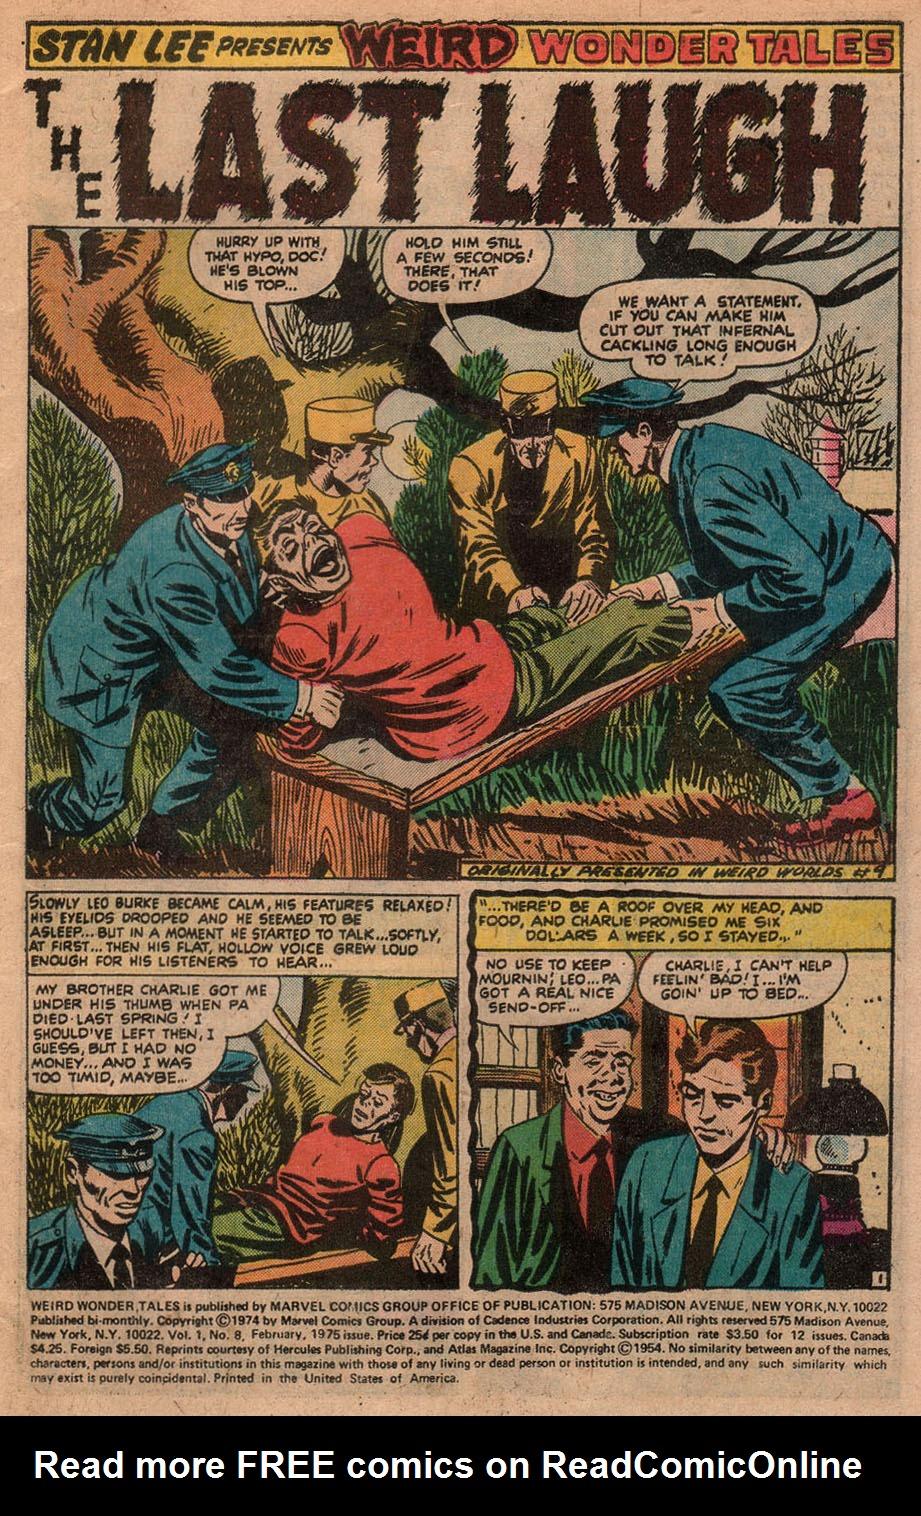 Read online Adventures into Weird Worlds comic -  Issue #9 - 17